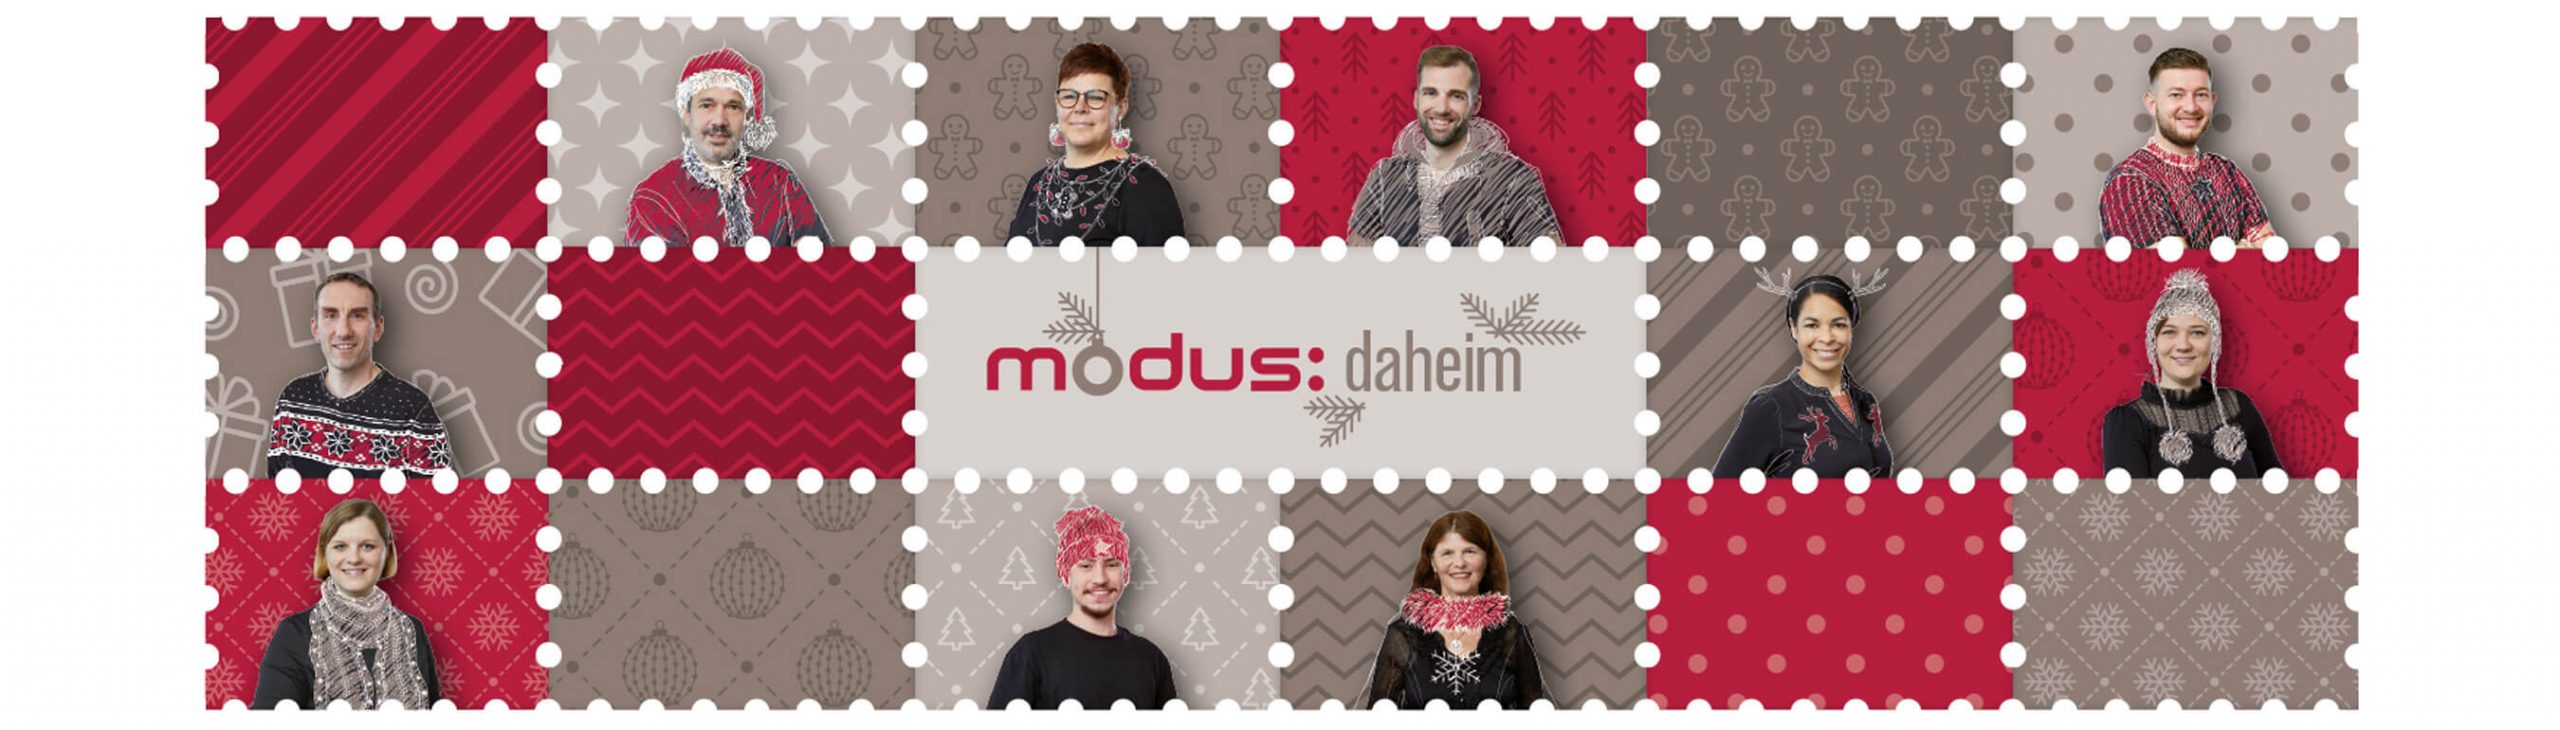 Frohe Weihnachten wünscht das modus:-Team